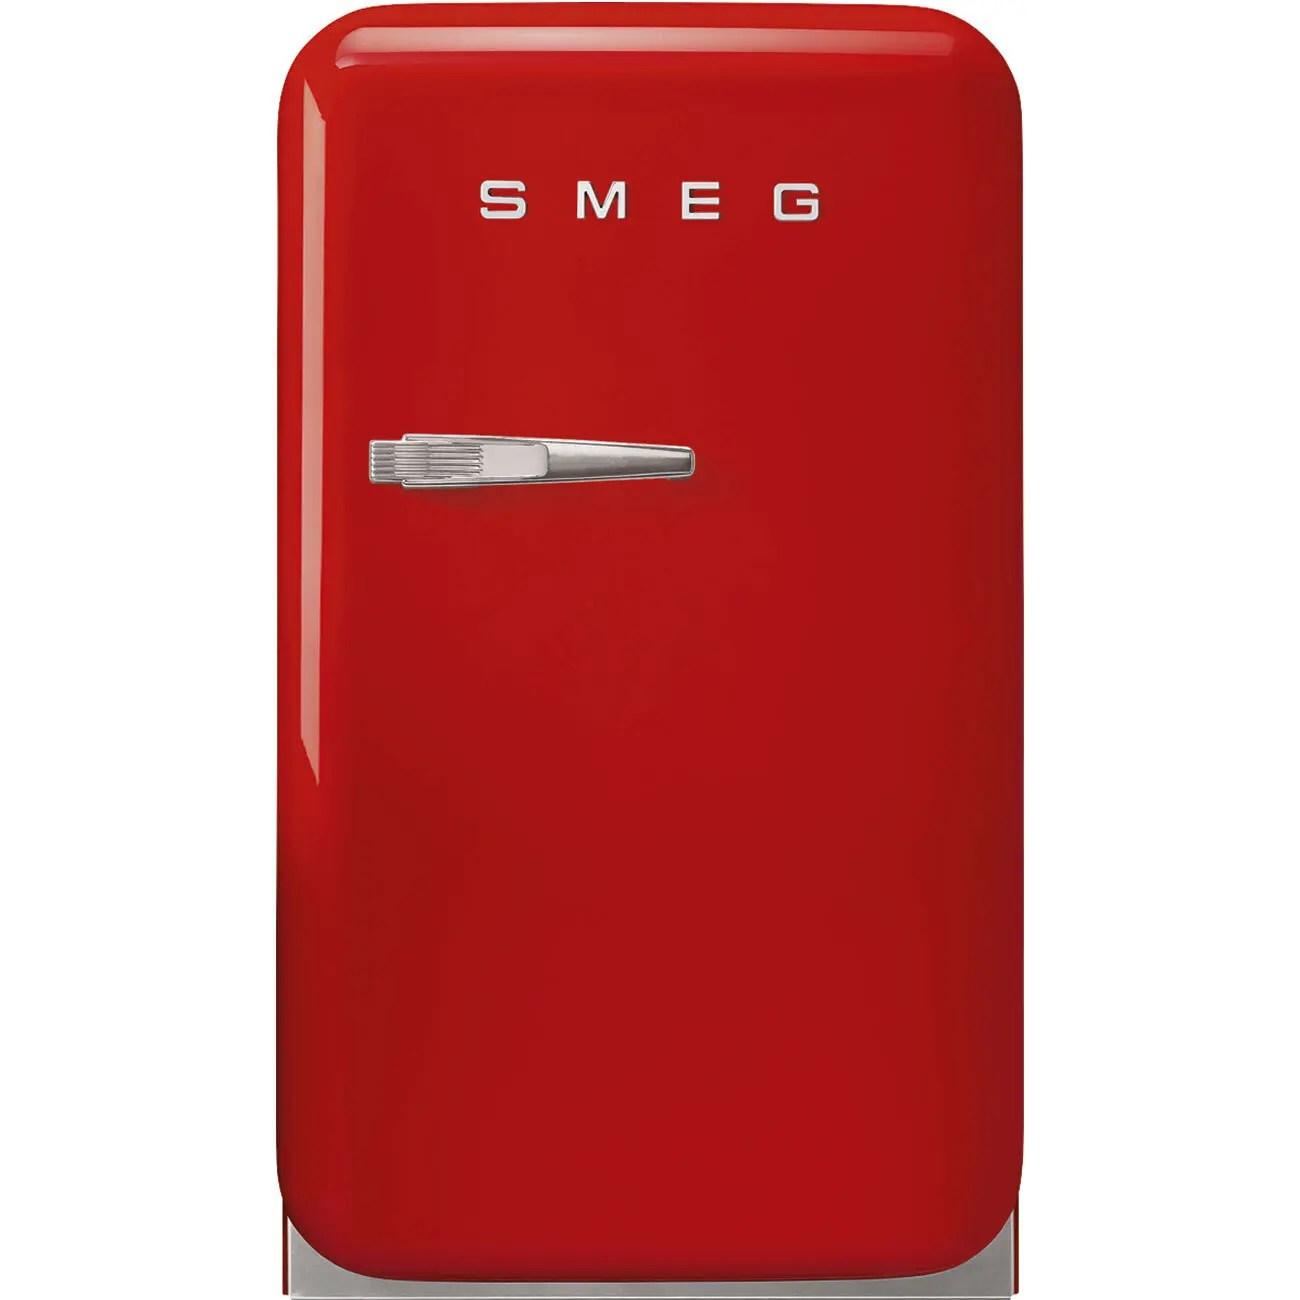 Refrigerator Red